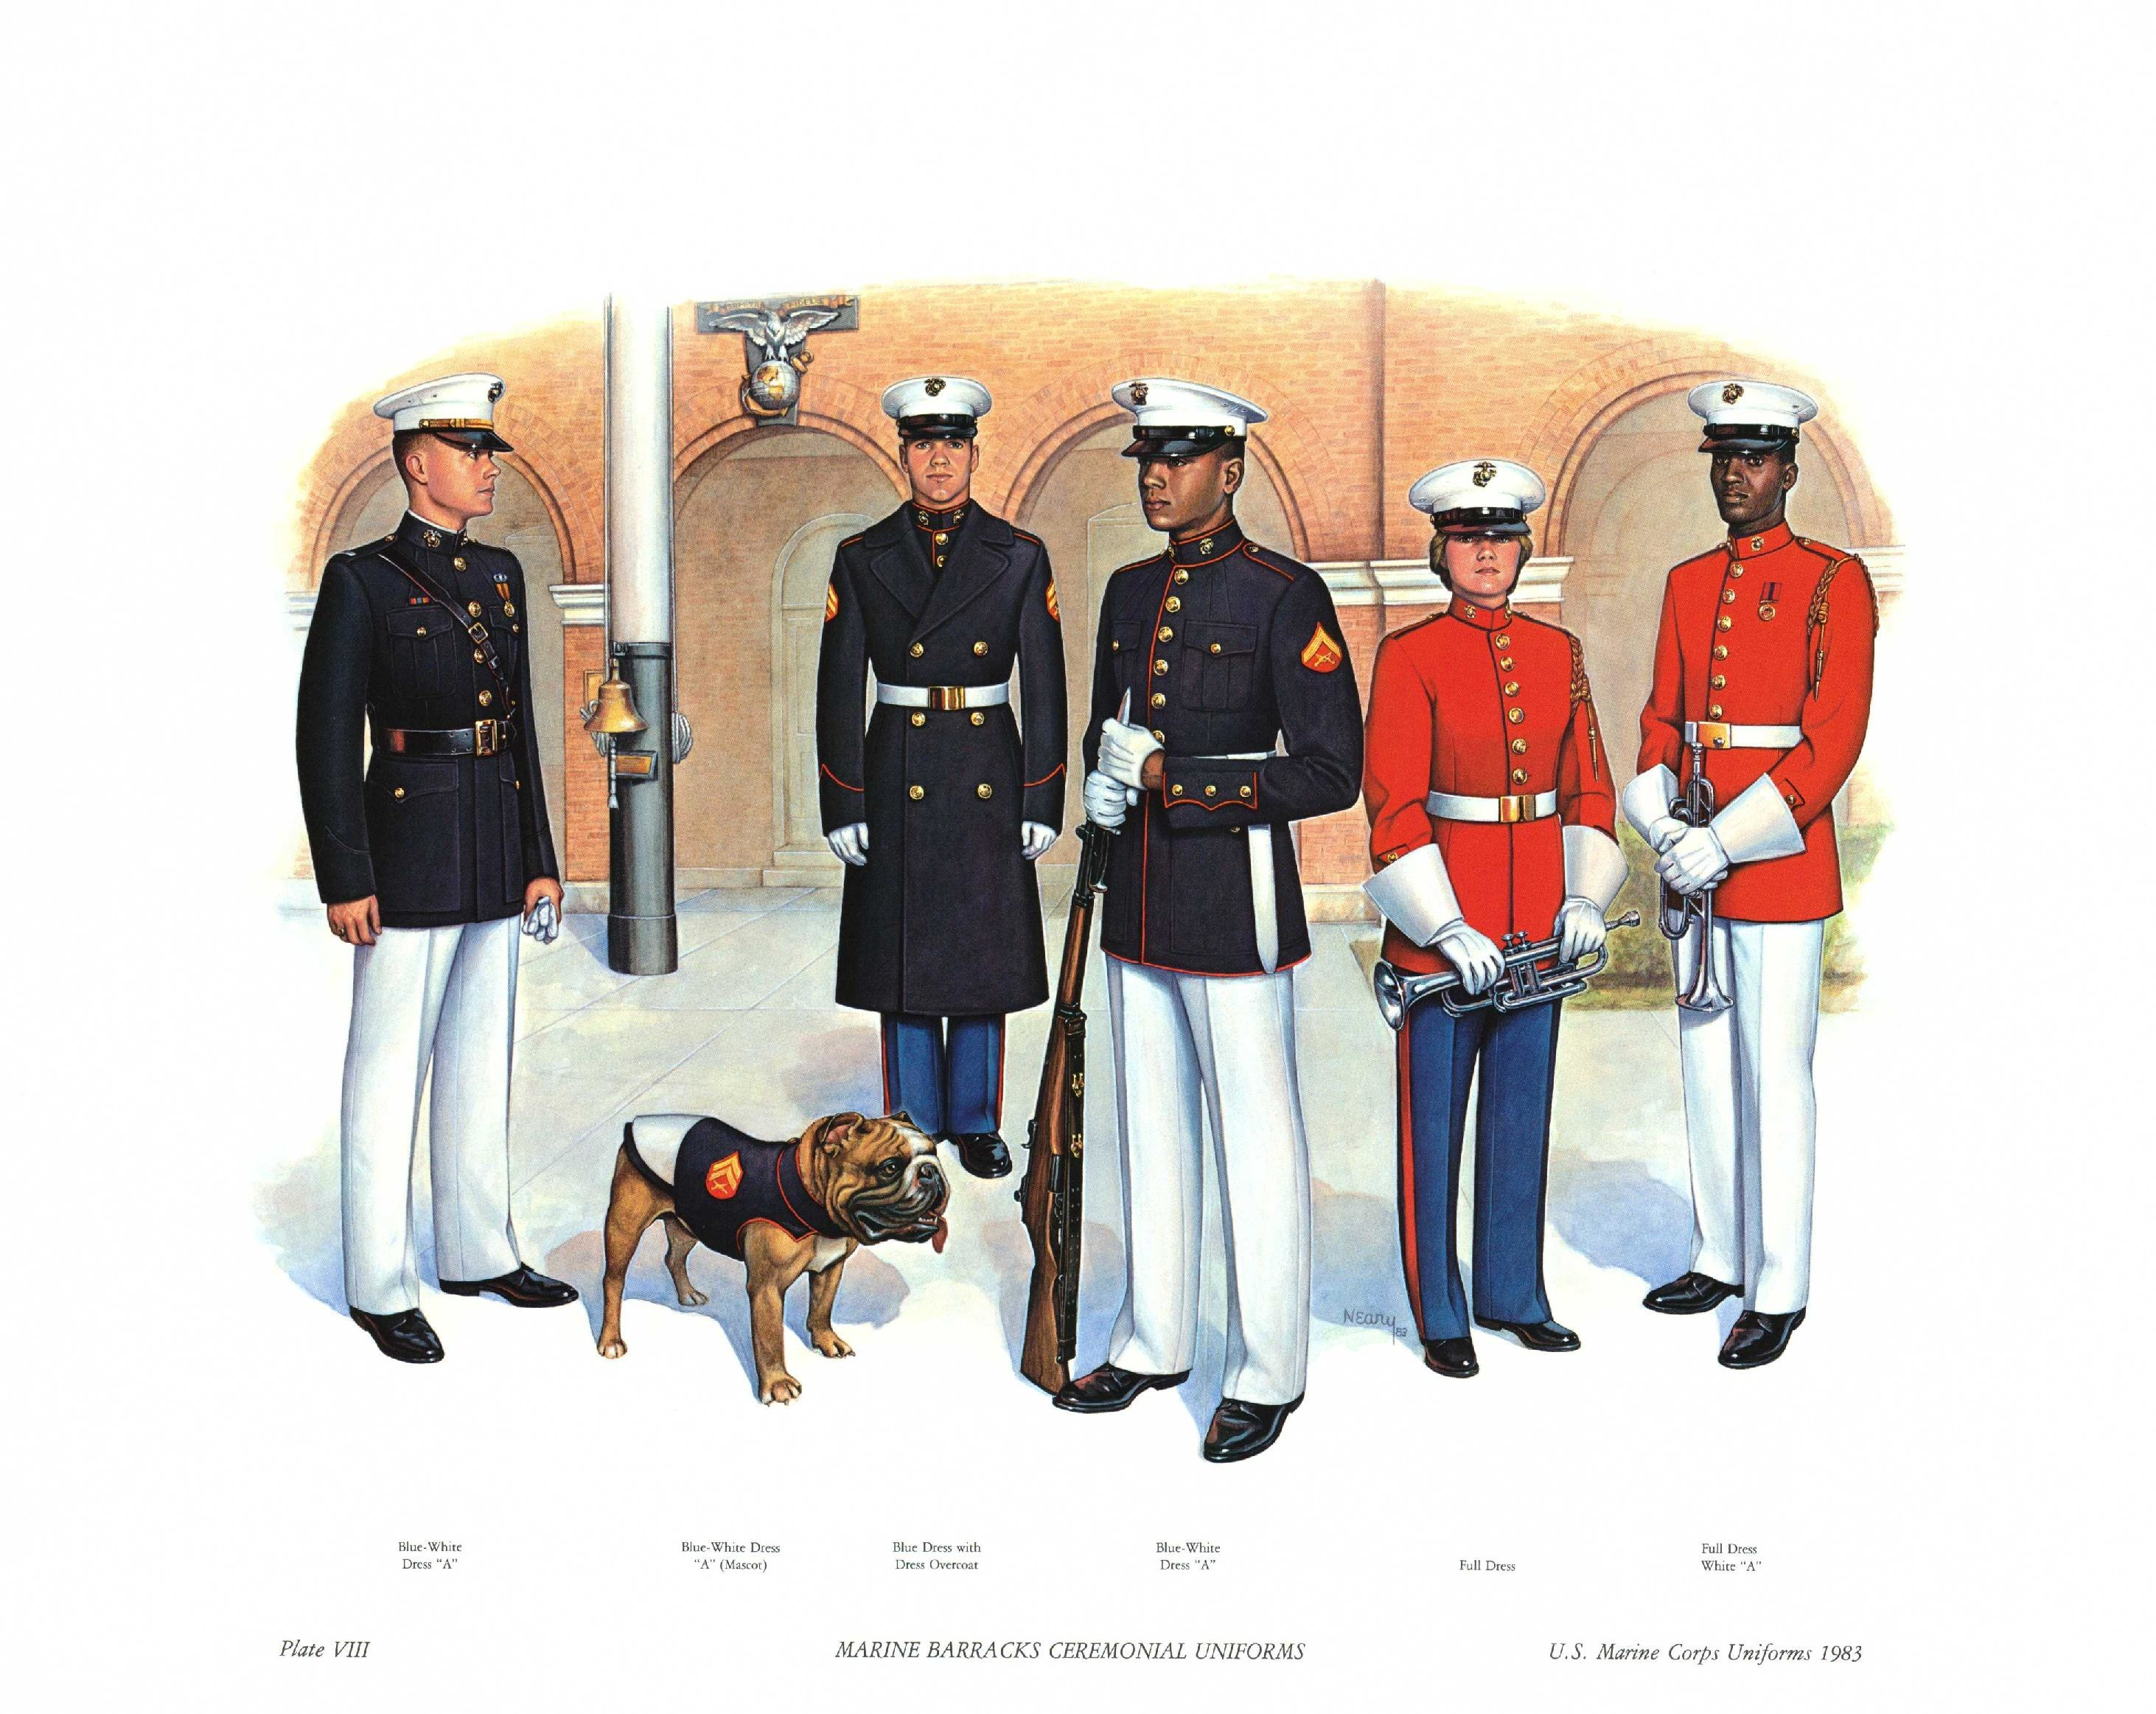 File:Plate VIII, Marine Barracks Ceremonial Uniforms - U S